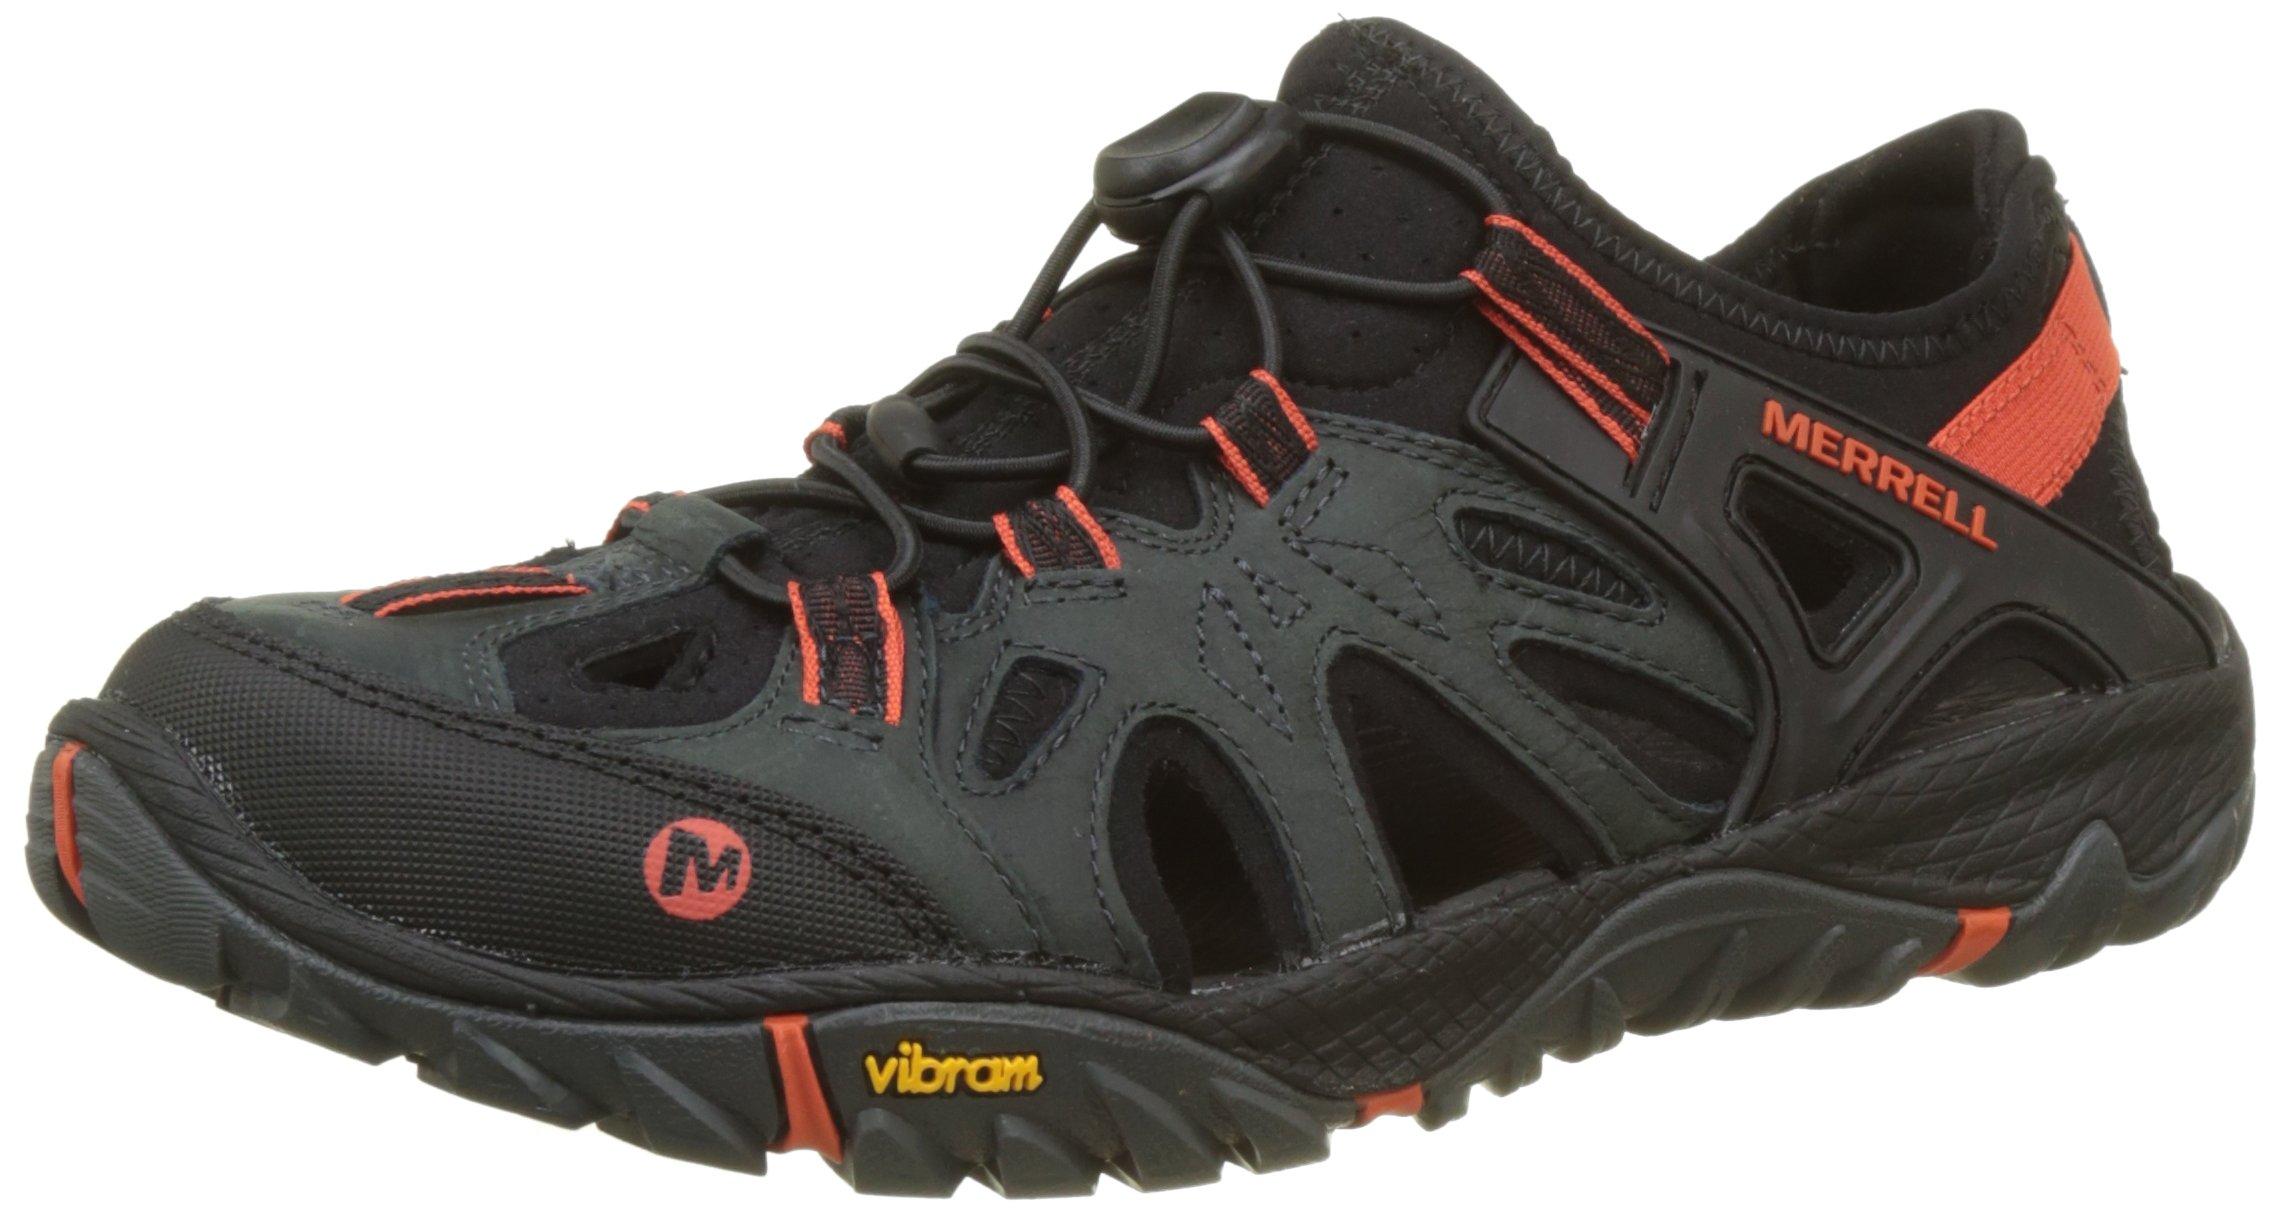 Merrell Men's All Out Blaze Sieve Water Shoes, Grey Dark Slate, 7 (41 EU) by Merrell